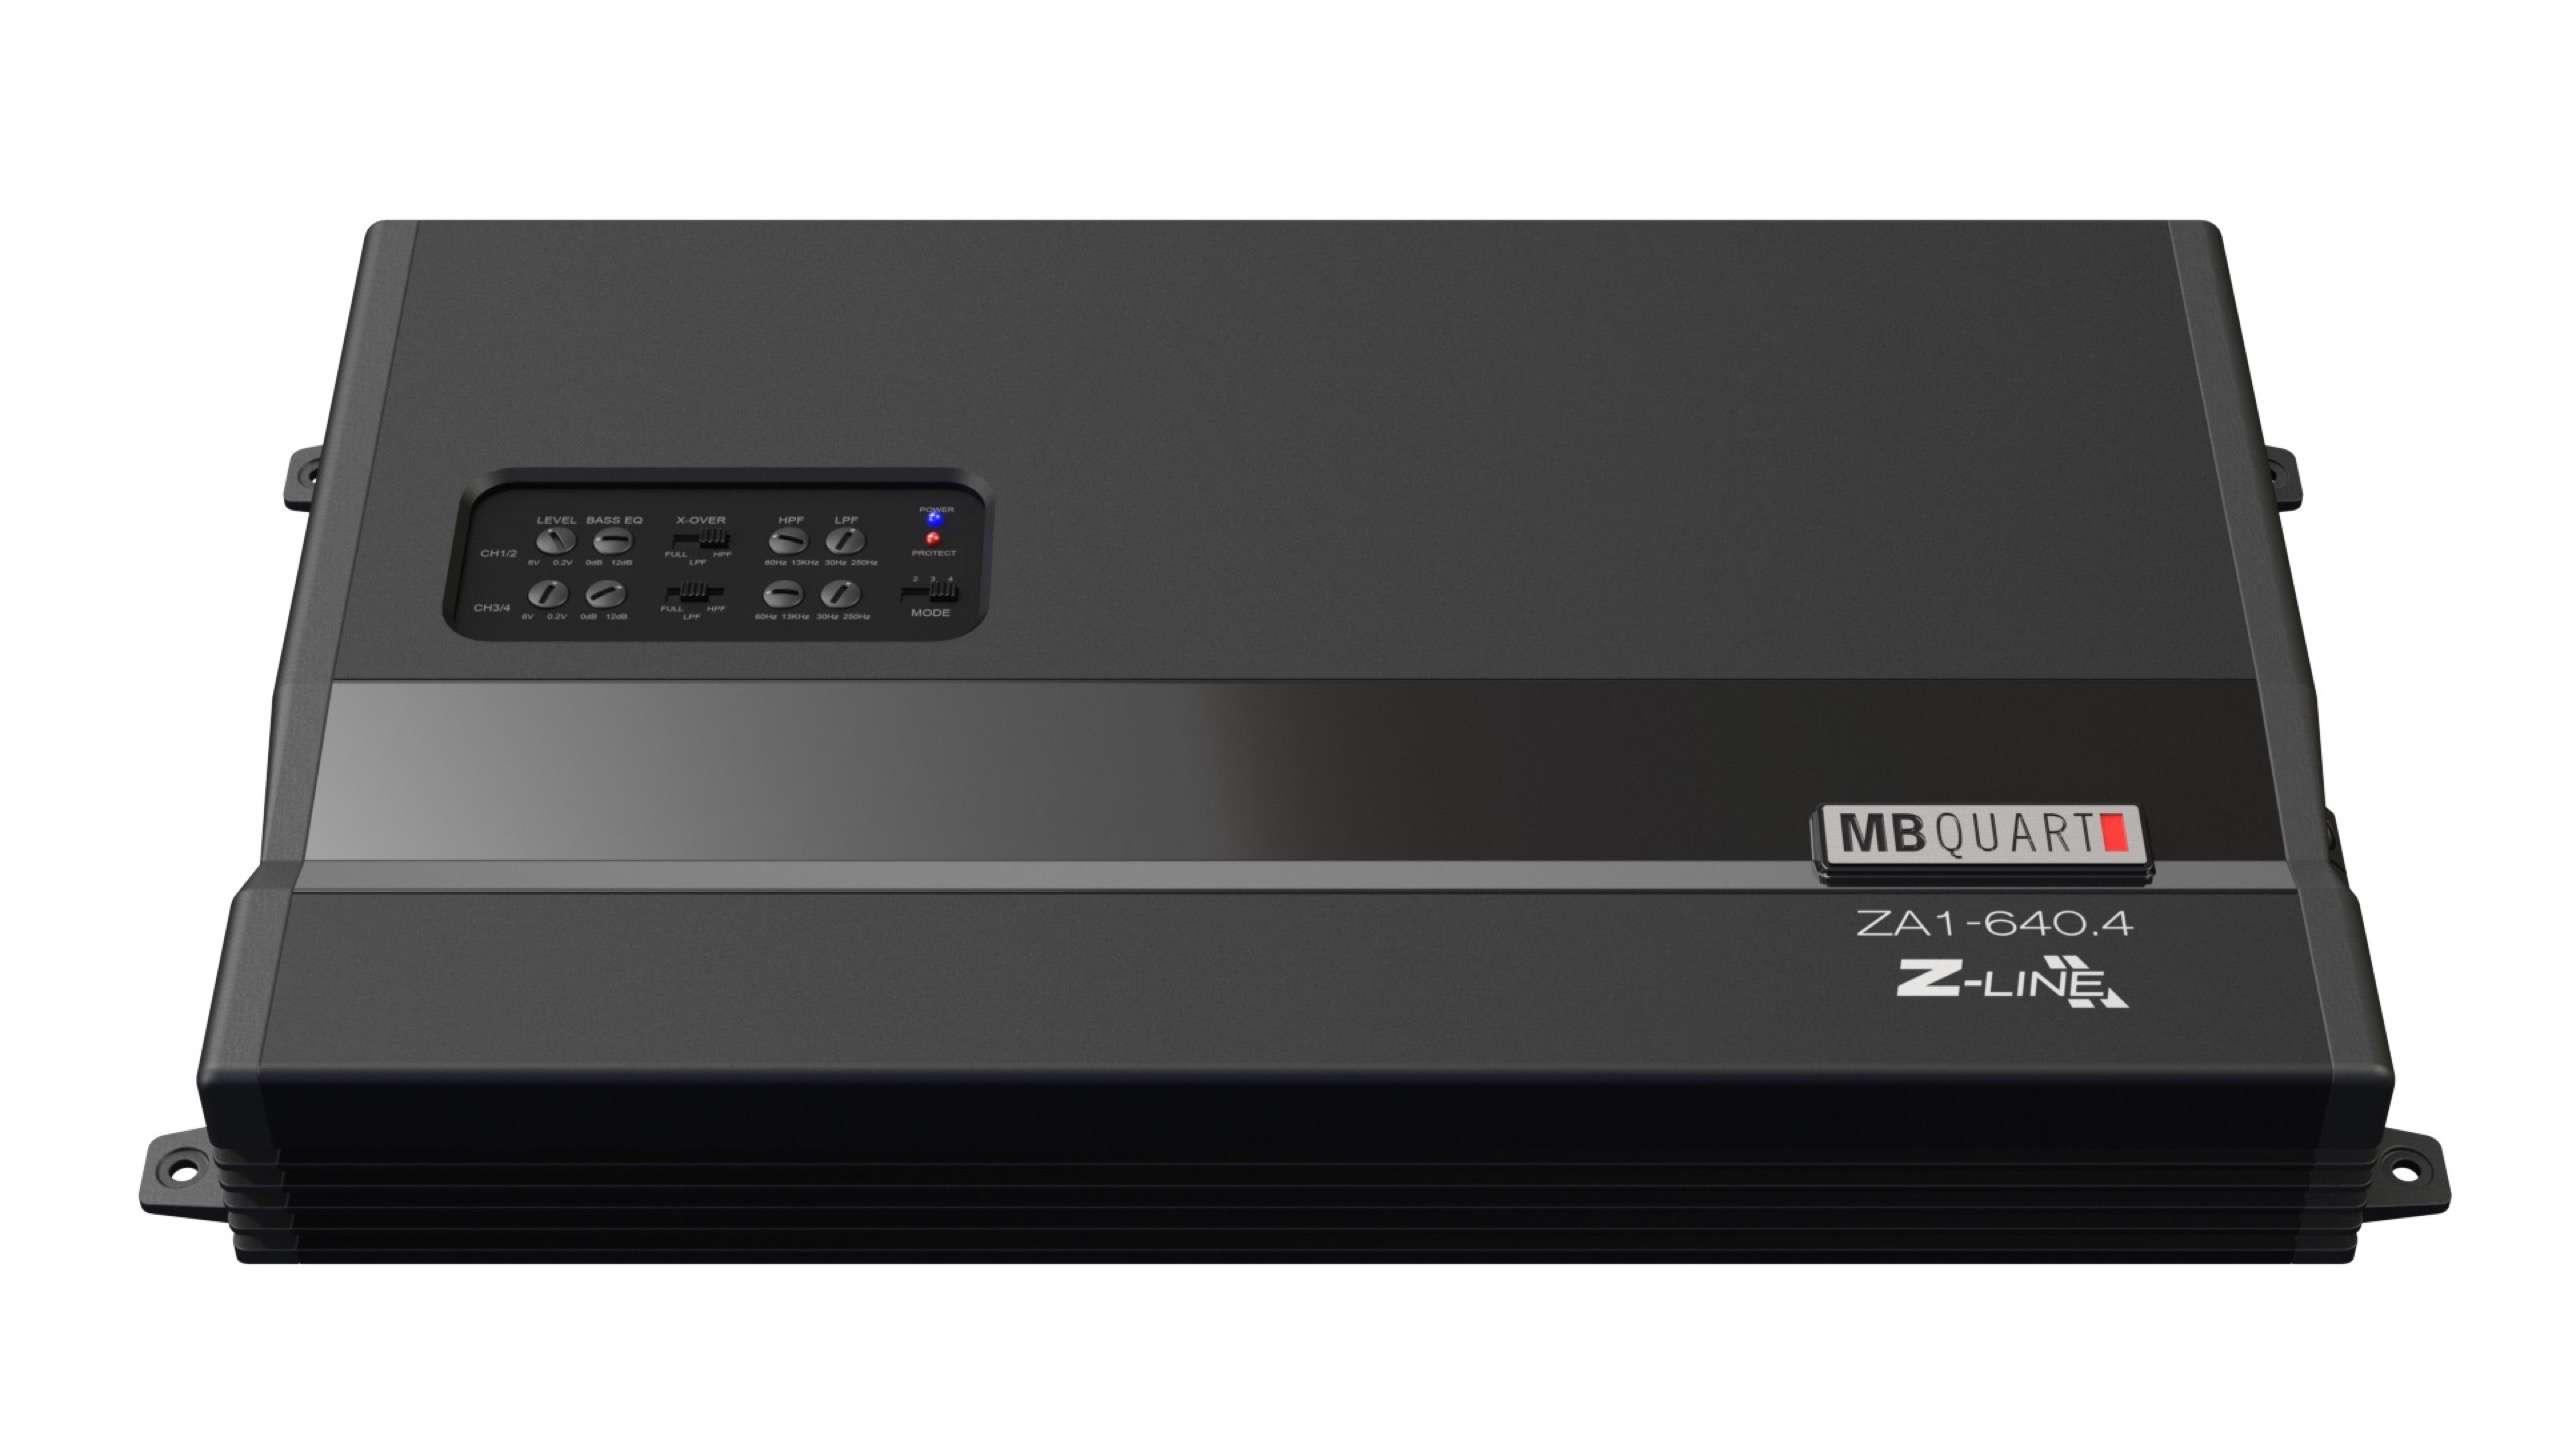 Pasmag Performance Auto And Sound Amplifiers Buyers Guide Mb Quart Premium Series Digital Car Audio System Z Line